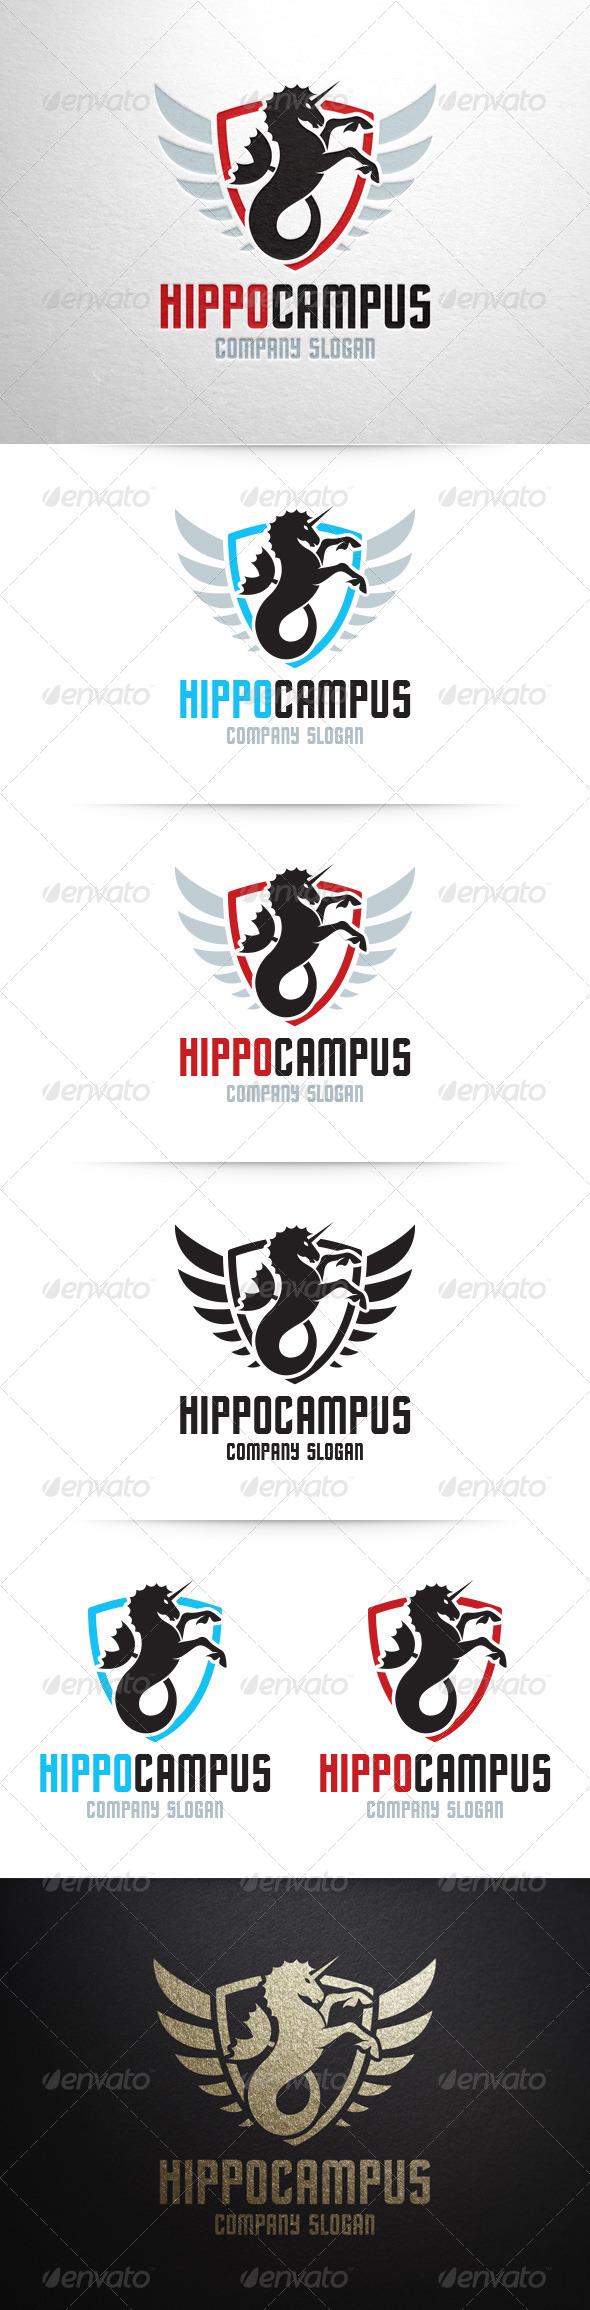 GraphicRiver Hippocampus Logo Template 6651980